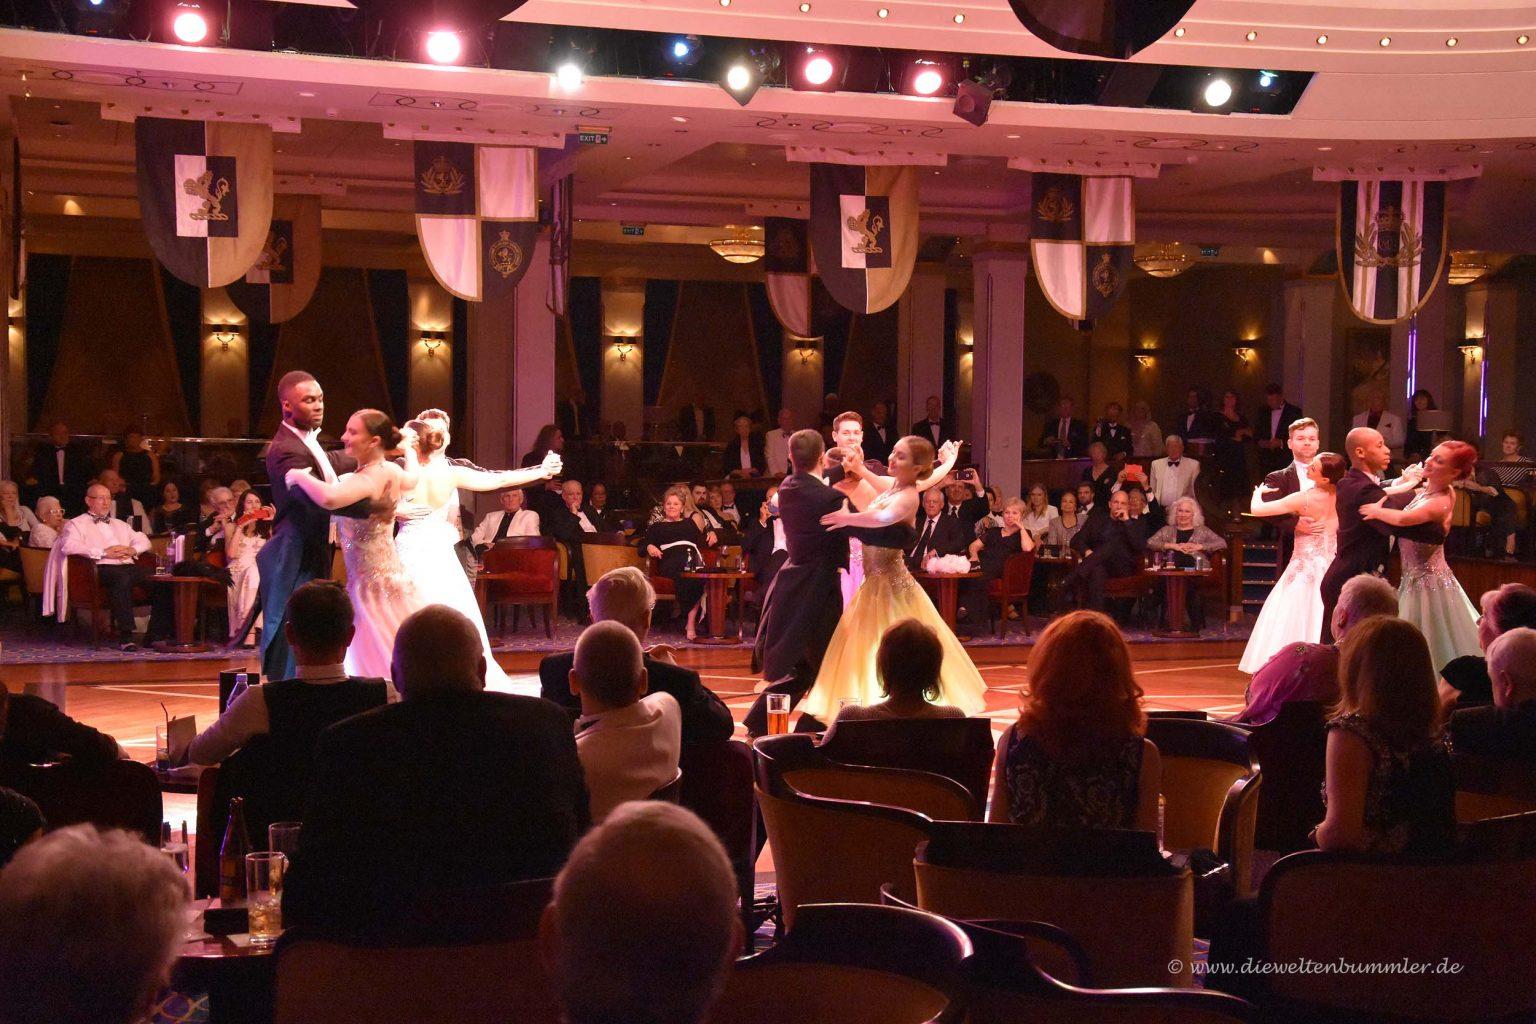 Tanz-Ensemble der Queen Mary 2